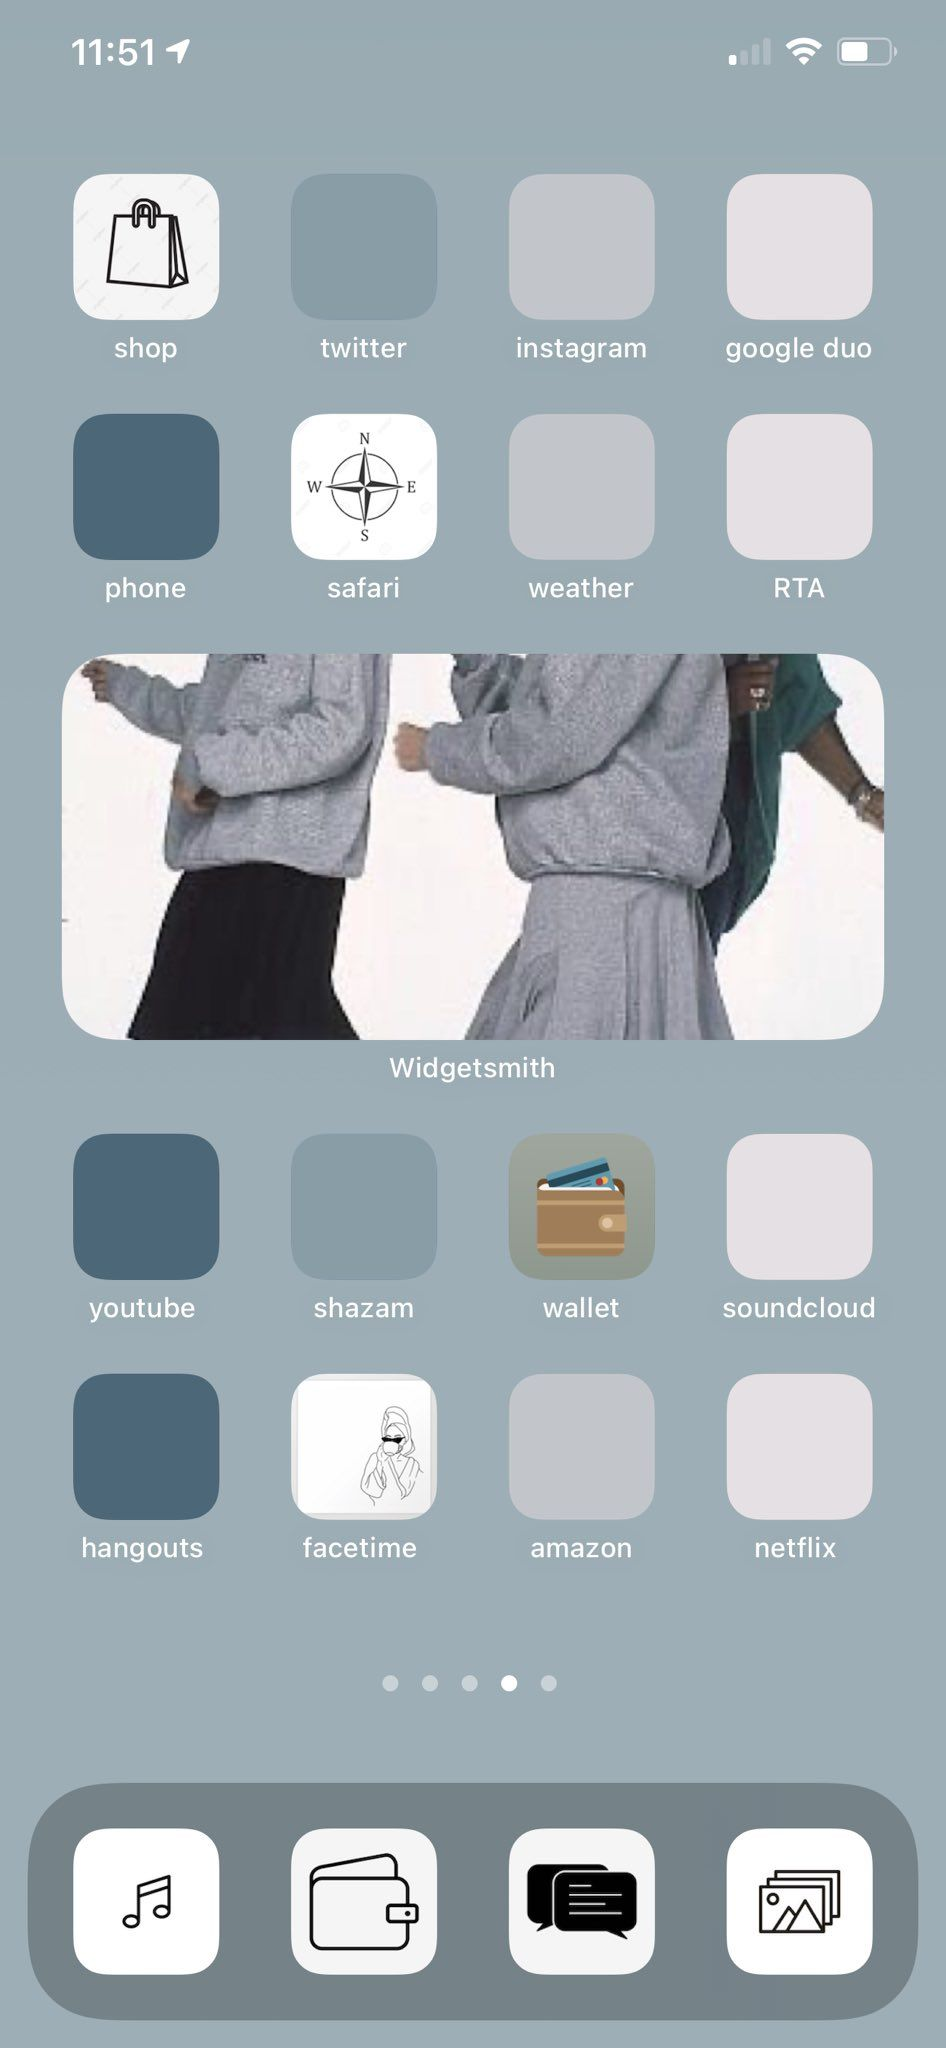 20 Ios 14 Home Screen Ideas Part 3 Straphie Homescreen Iphone Home Screen Layout App Home Screen